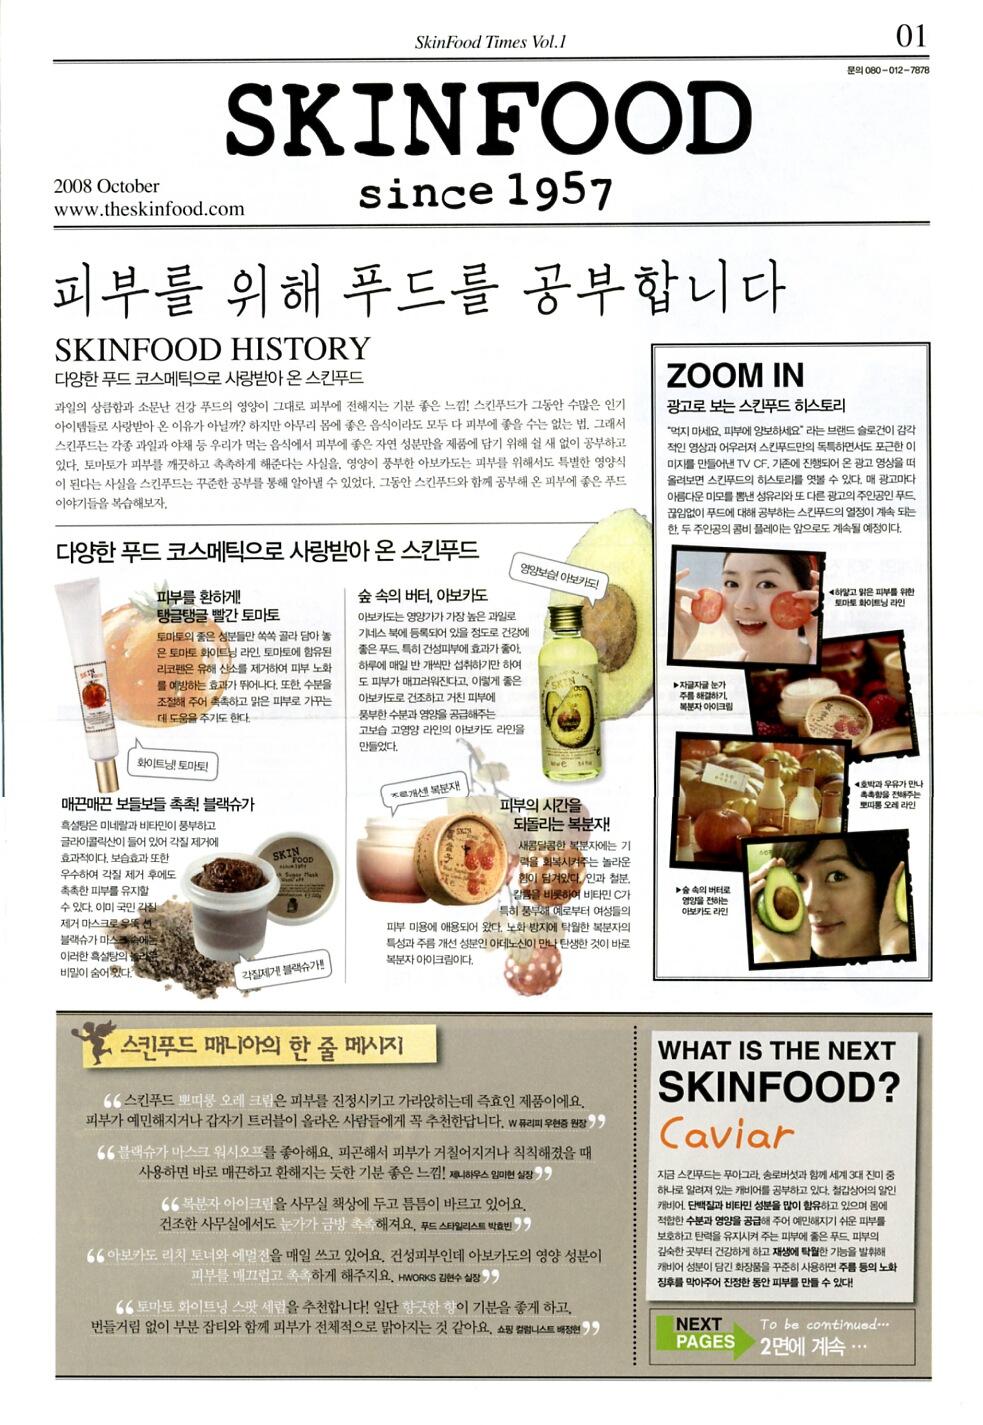 skinfoodtimes01-001ss.jpg